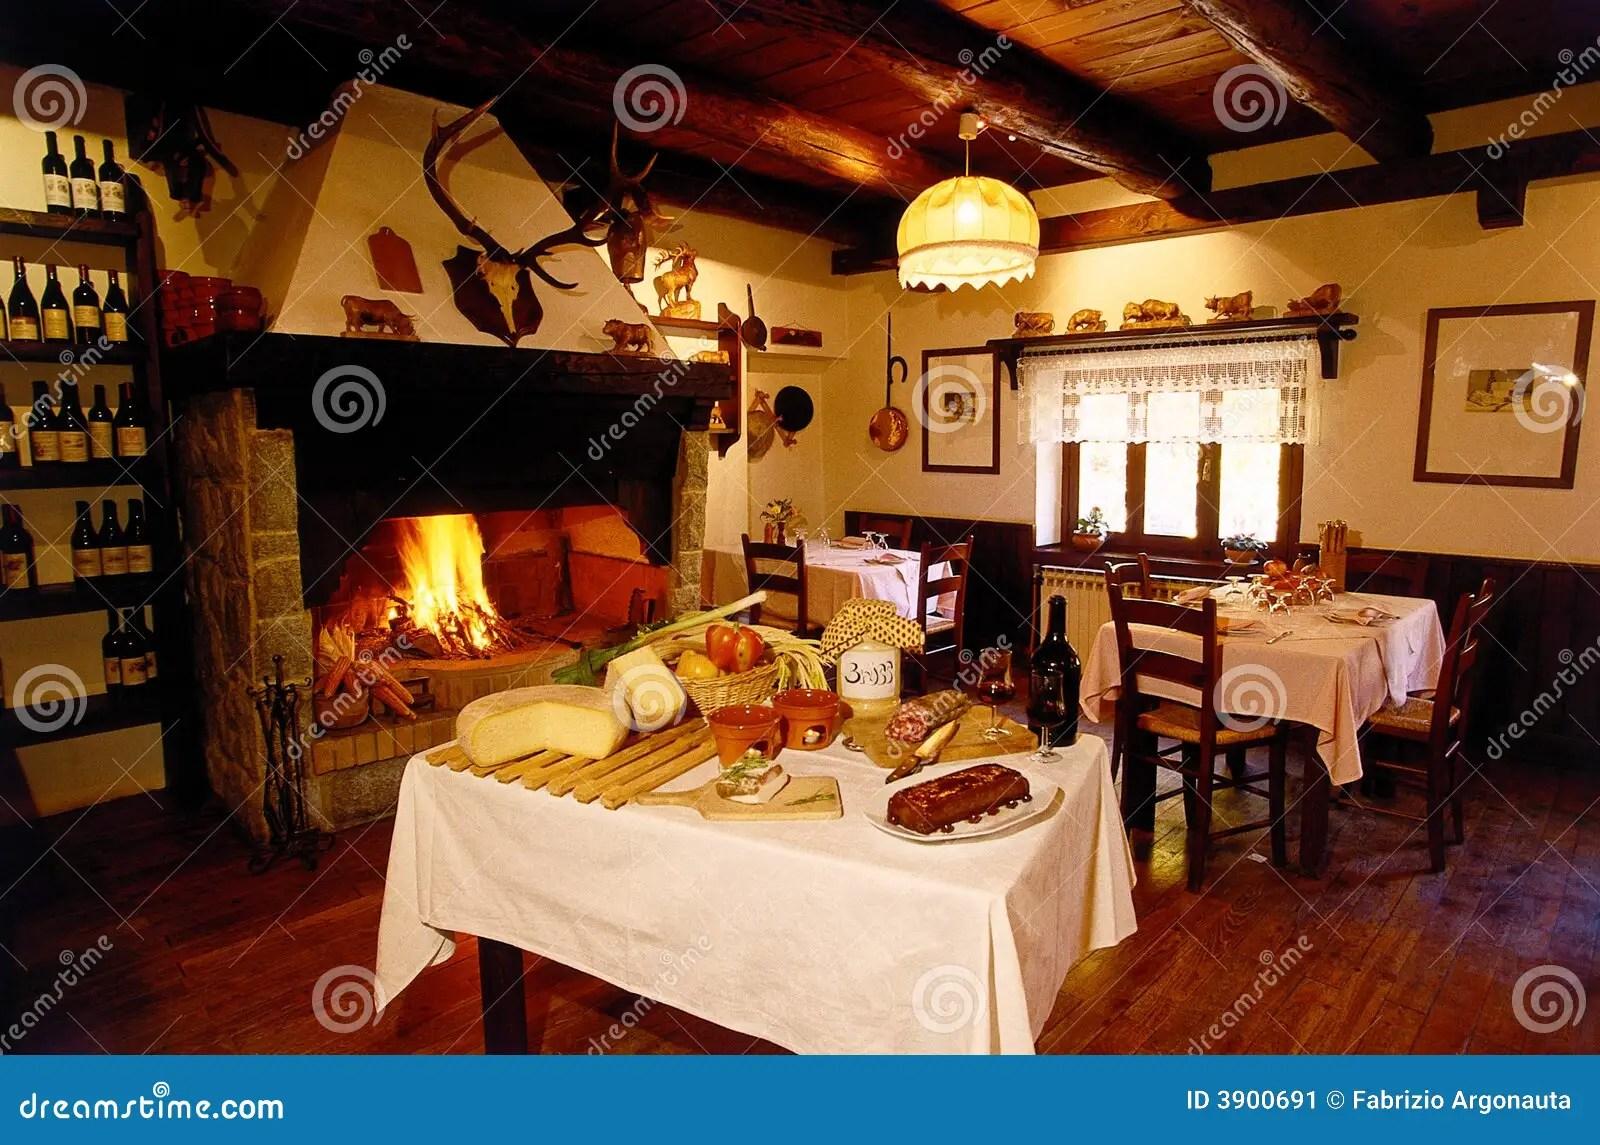 Alpine Restaurant Lounge Stock Image Image 3900691